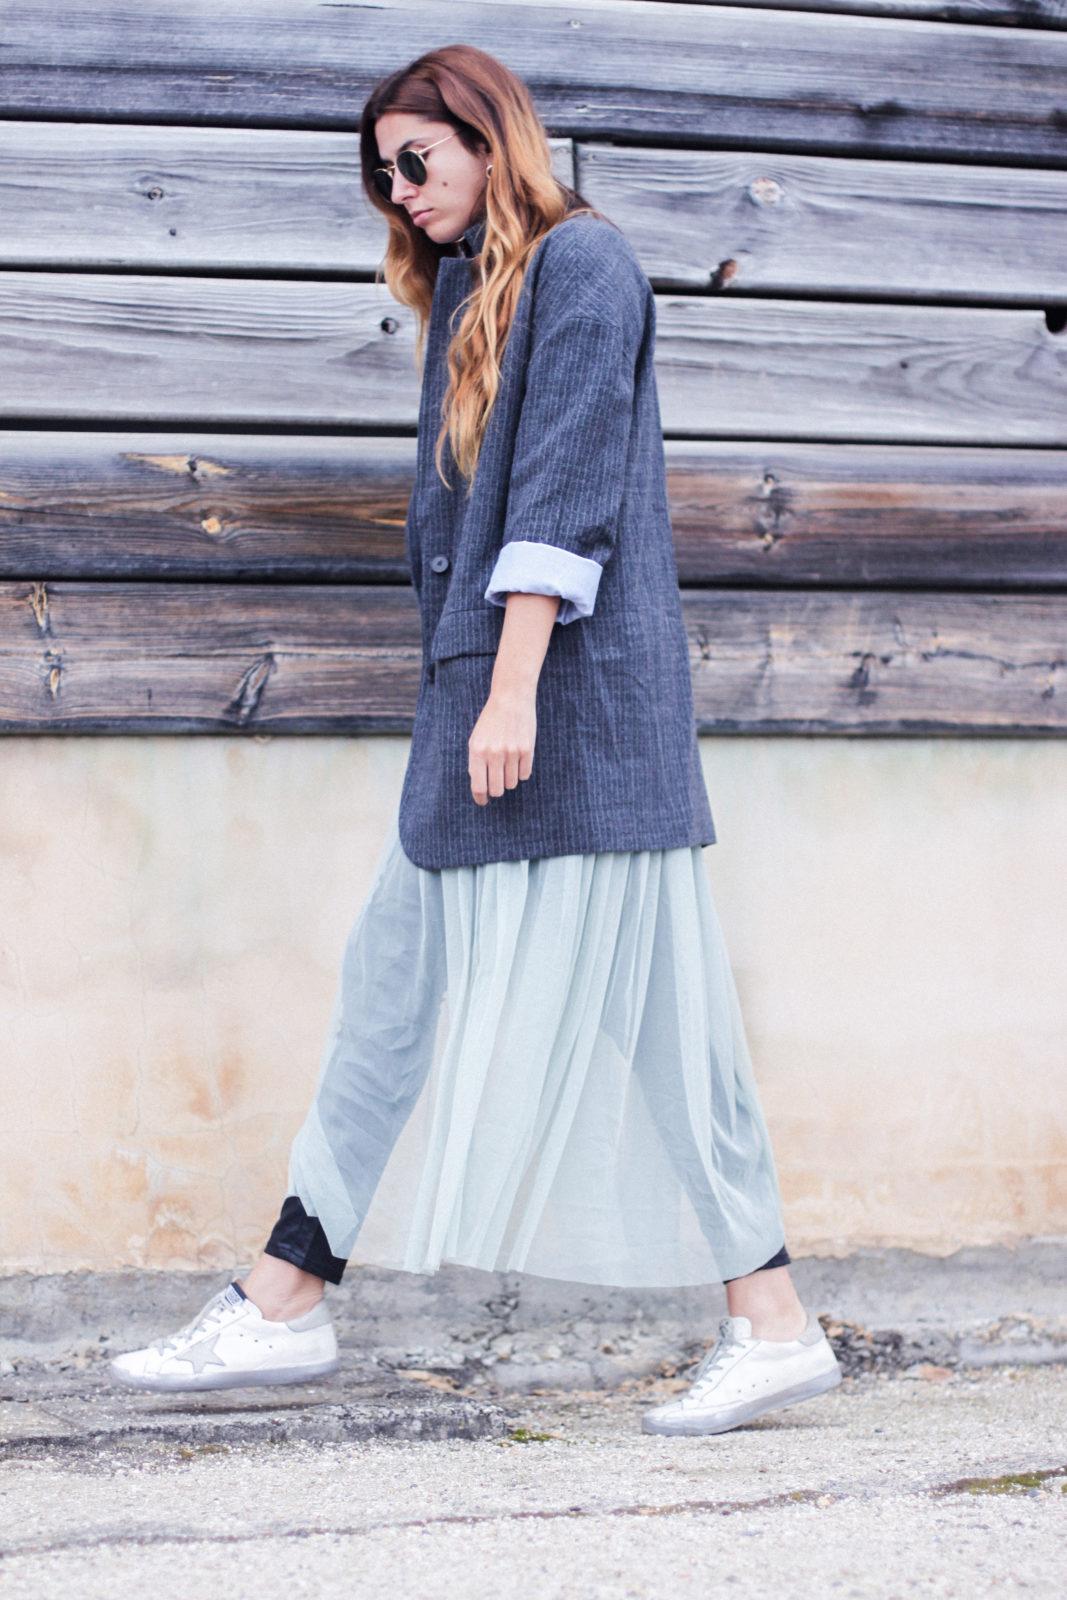 vestido_de_tul_sobre_pantalon_estilo_bailarina_blazer_oversize_pendientes_de_aros_choker_tendencias_trends_fall_2016_street_style_donkeycool-17